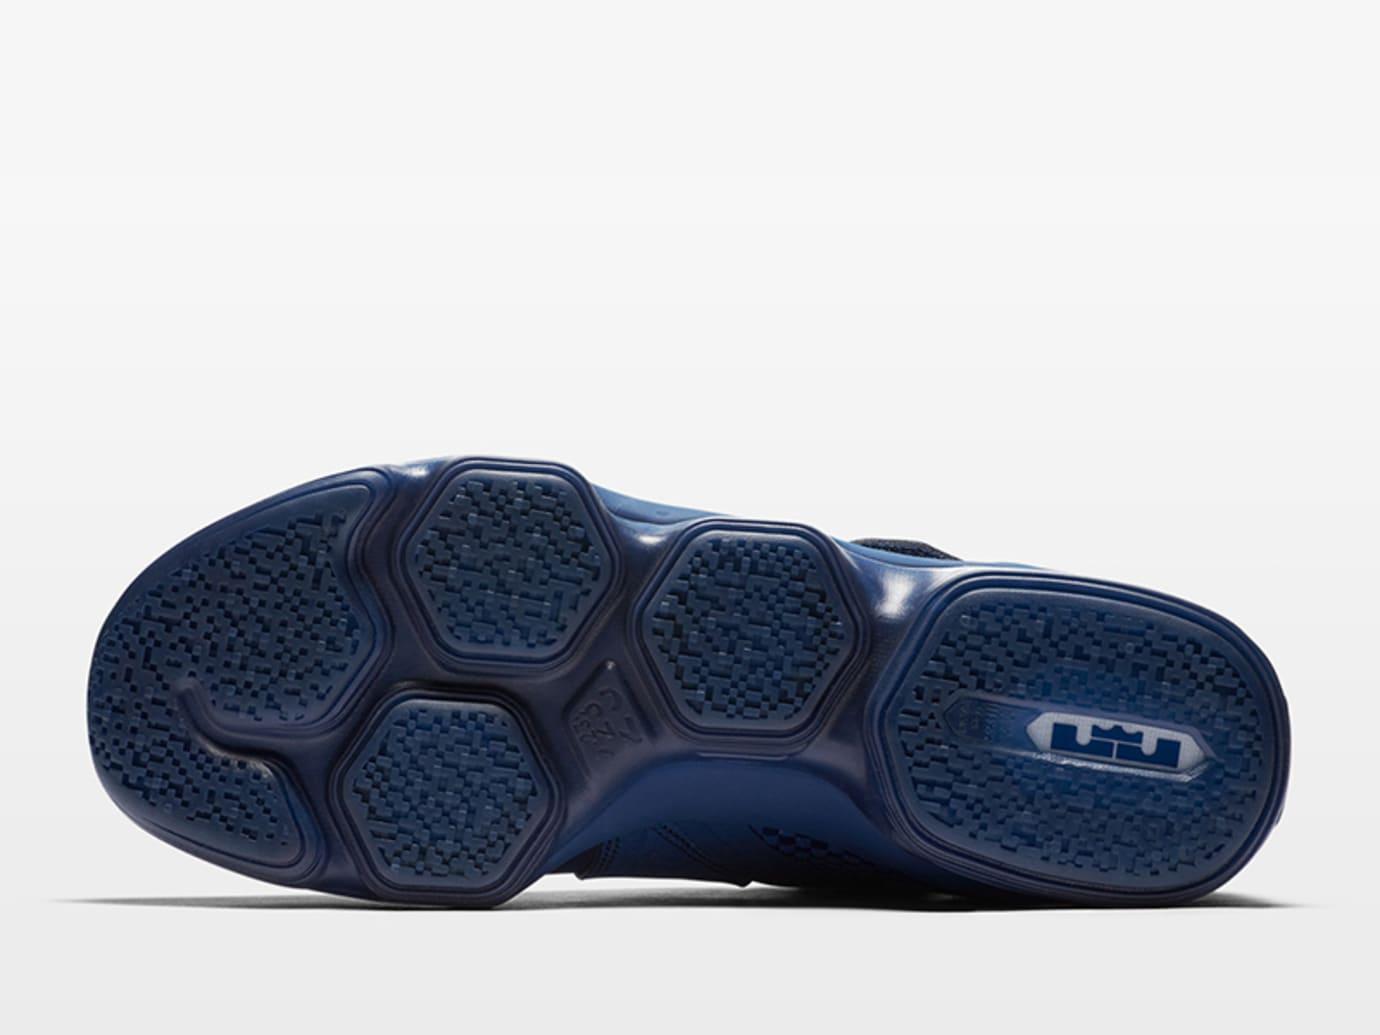 6e236655de3 Nike LeBron 14 Agimat Philippines Release Date